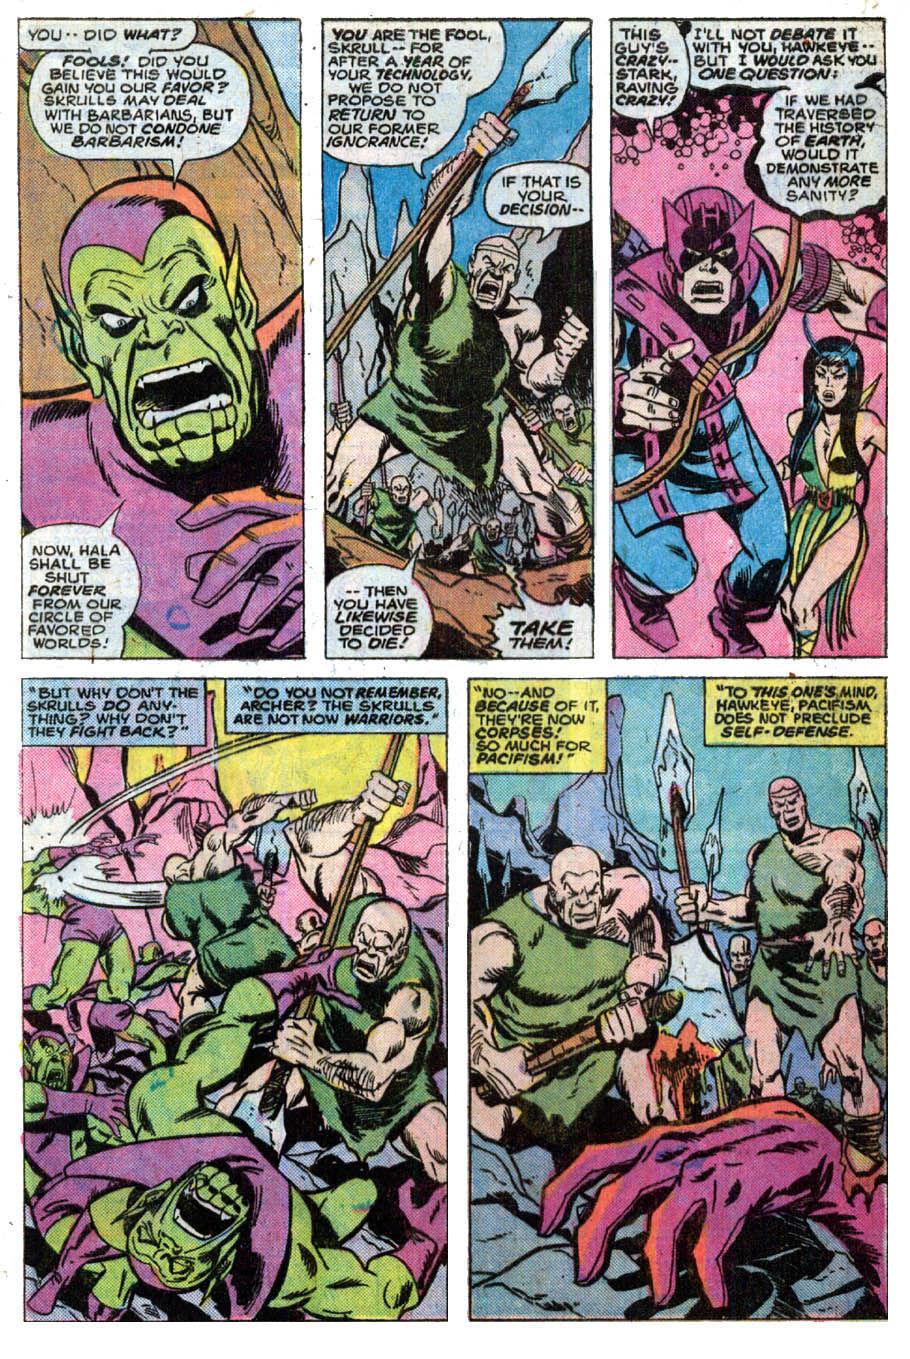 Avengers #133 (Written by Steve Englehart, Art by Sal Buscema))